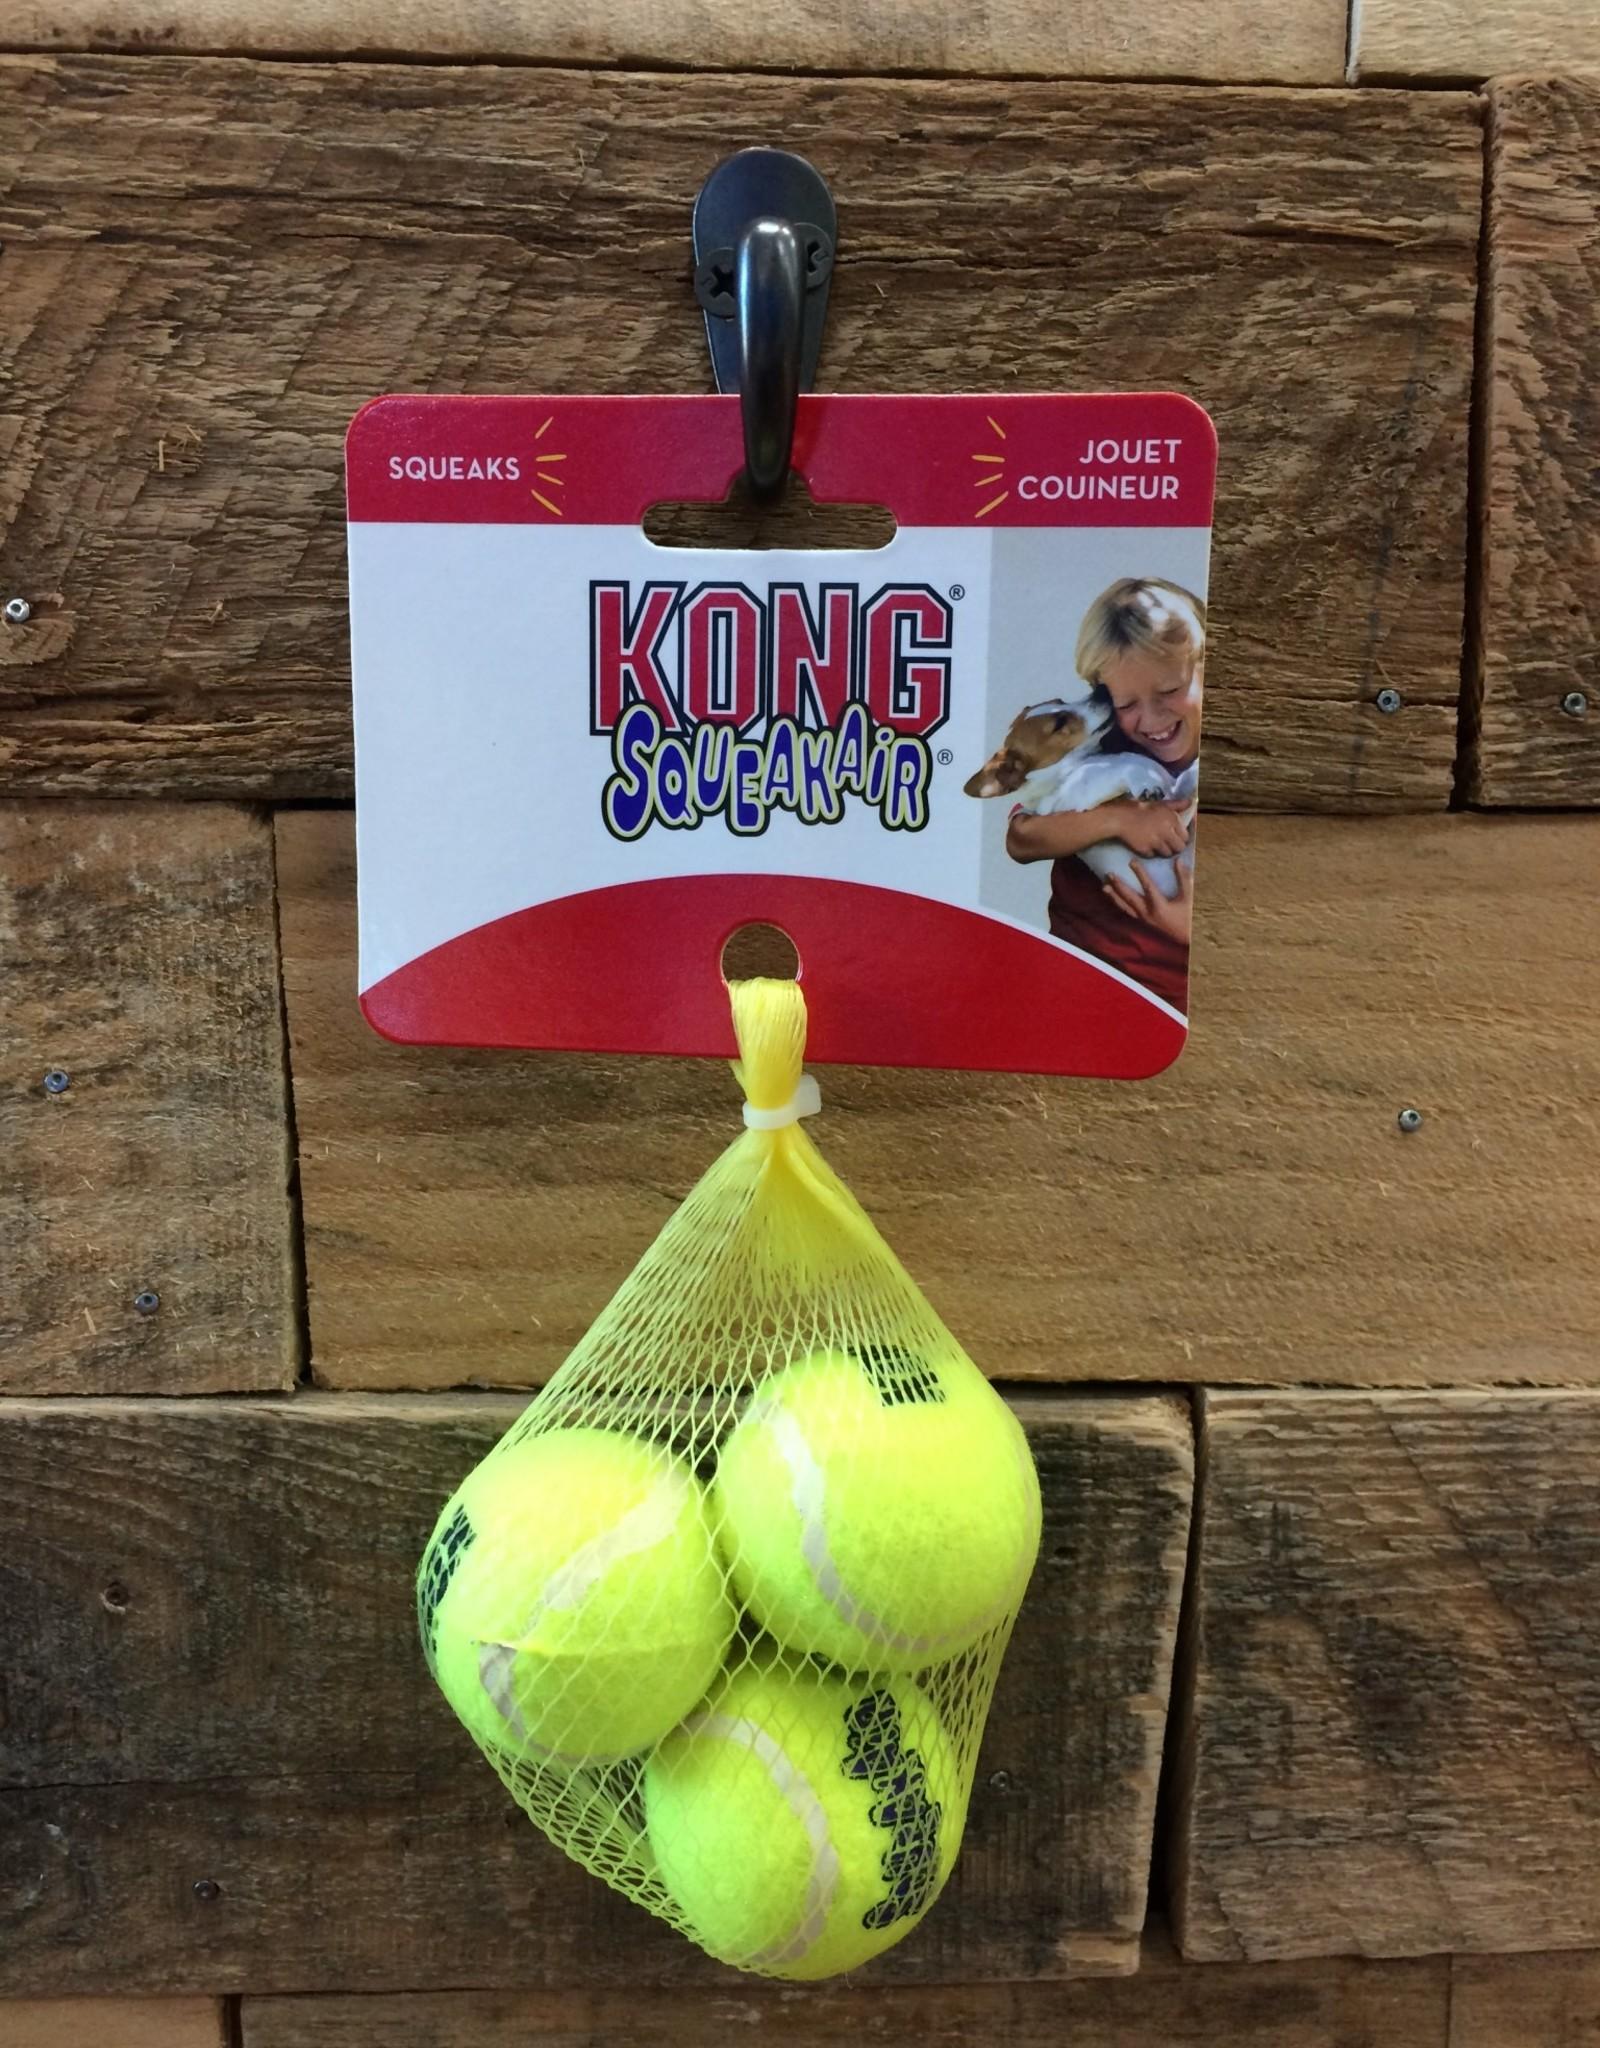 Kong Squeaker Tennis Balls Extra Small 3pack